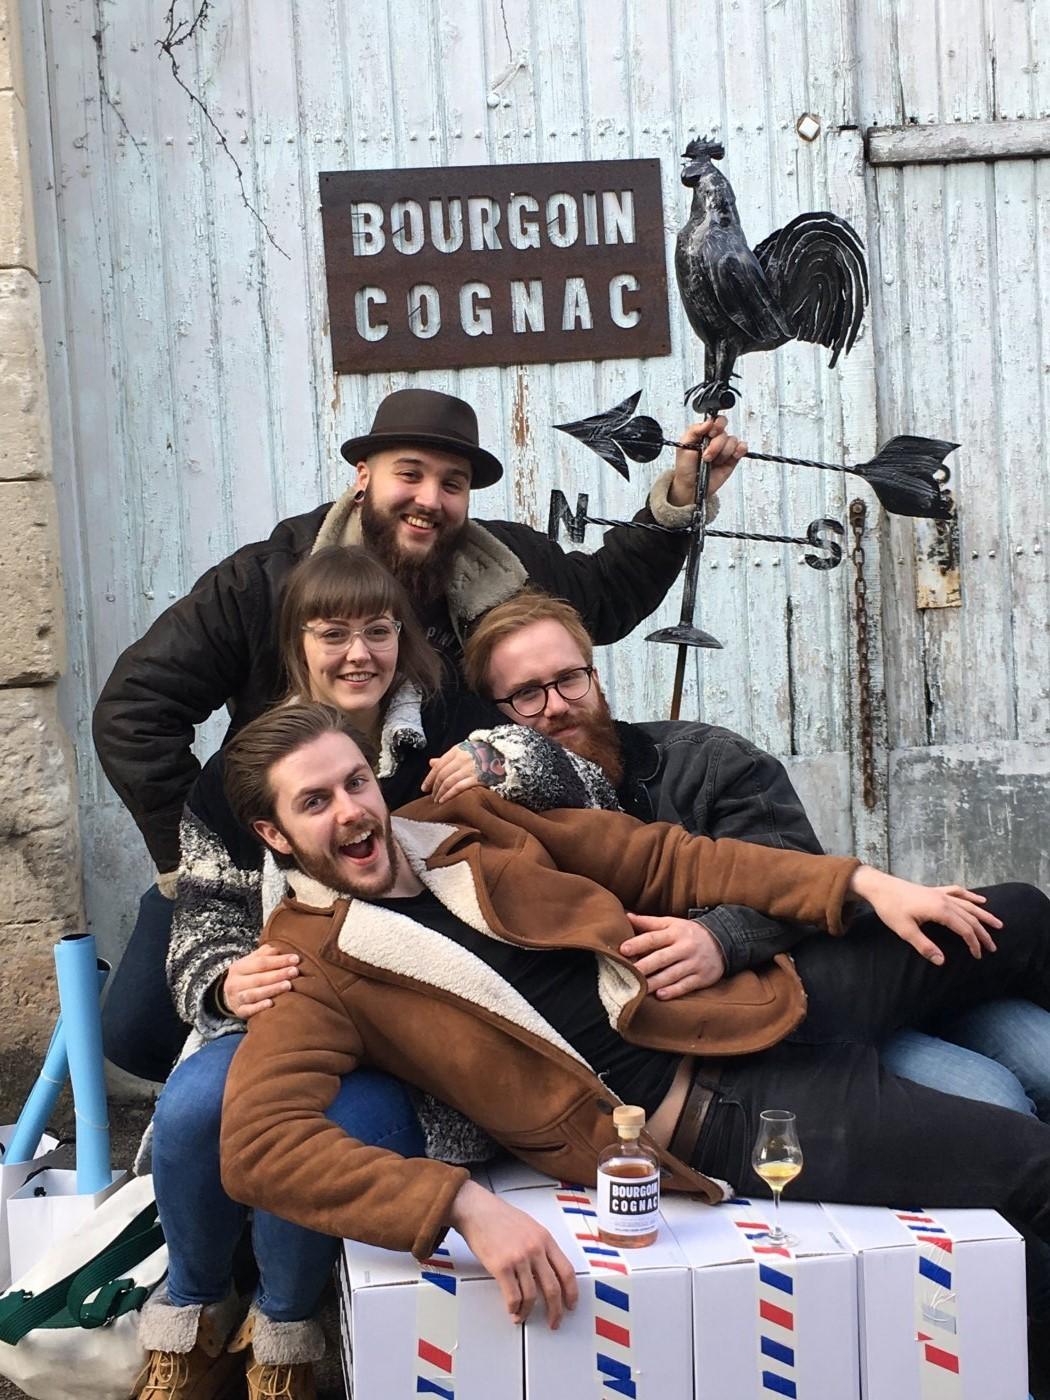 equipe-de-bourgoin-cognac